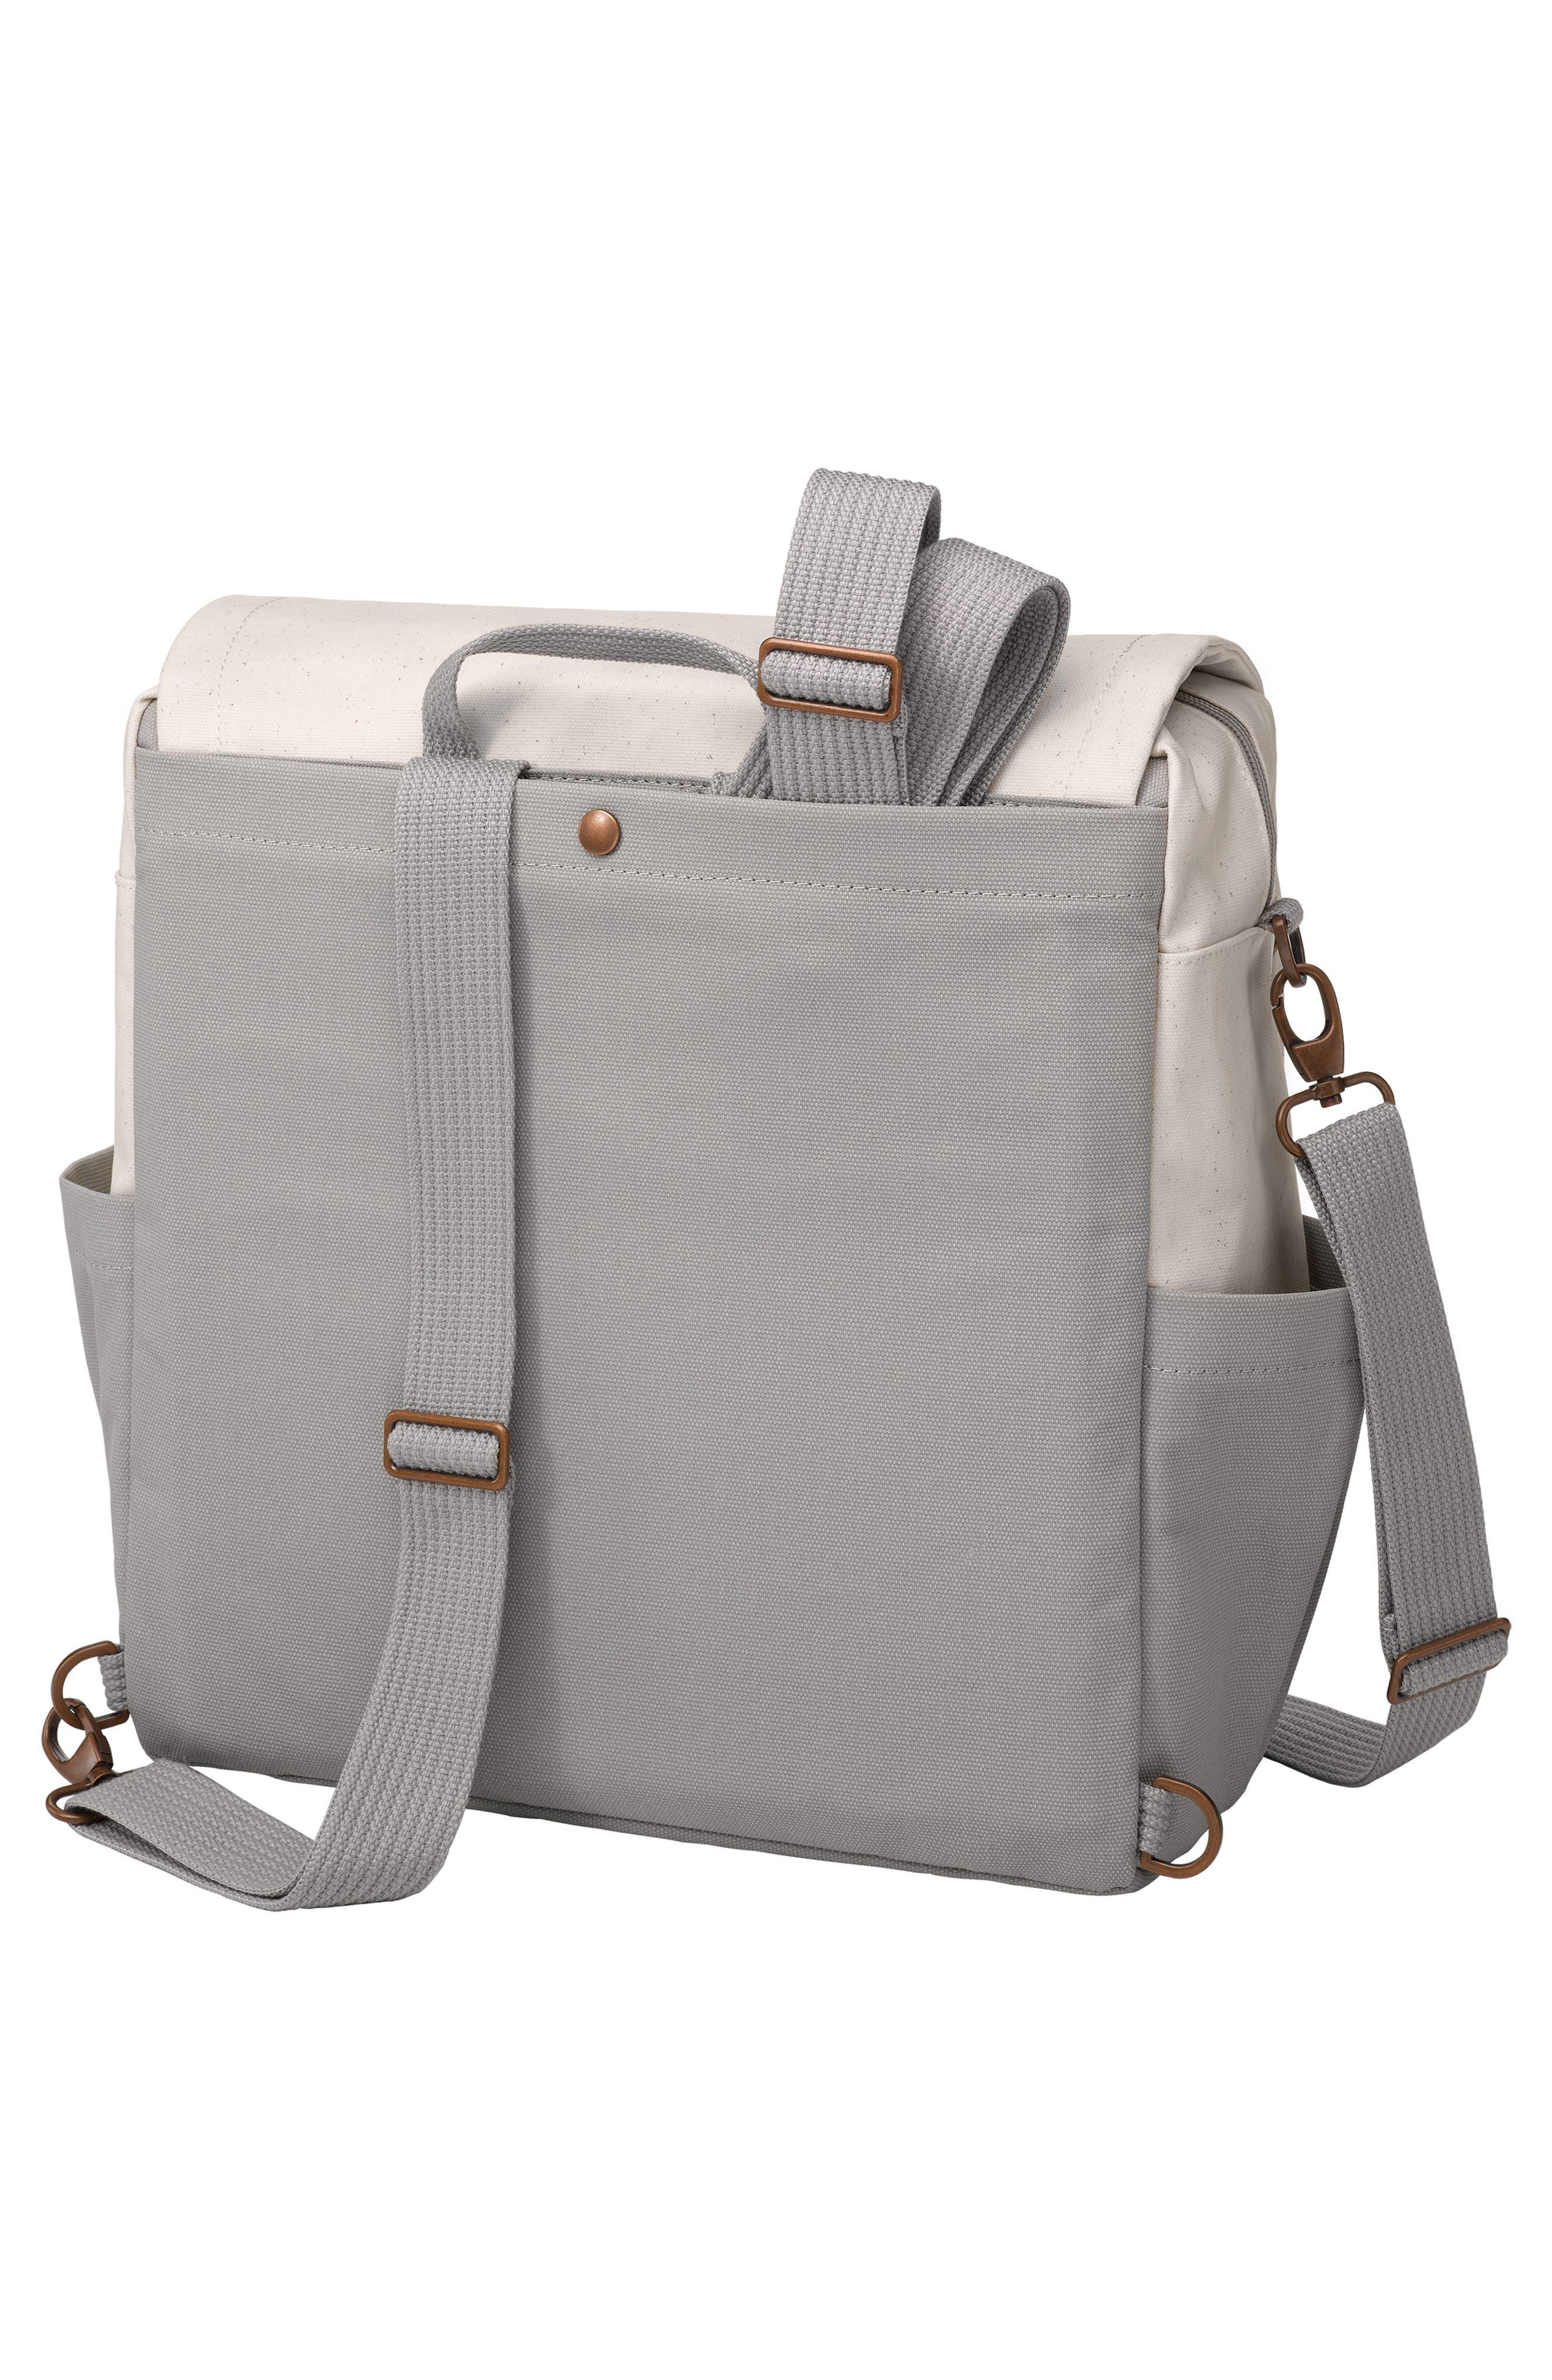 Boxy Backpack Diaper Bag,                             Alternate thumbnail 2, color,                             BIRCH/ STONE